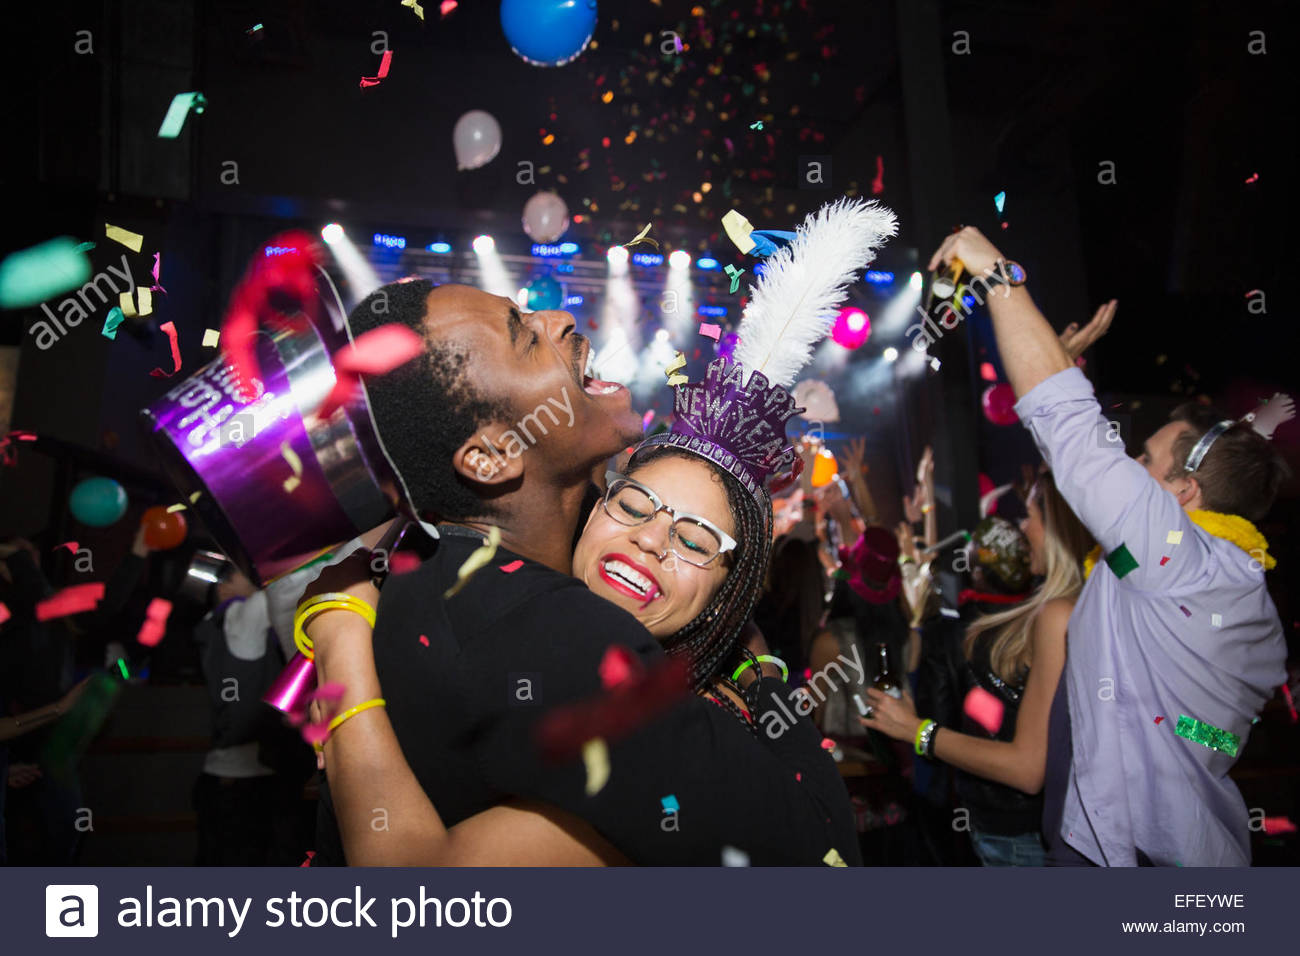 Konfetti fallen umarmt Paar genießt Neujahrsfeier Stockbild